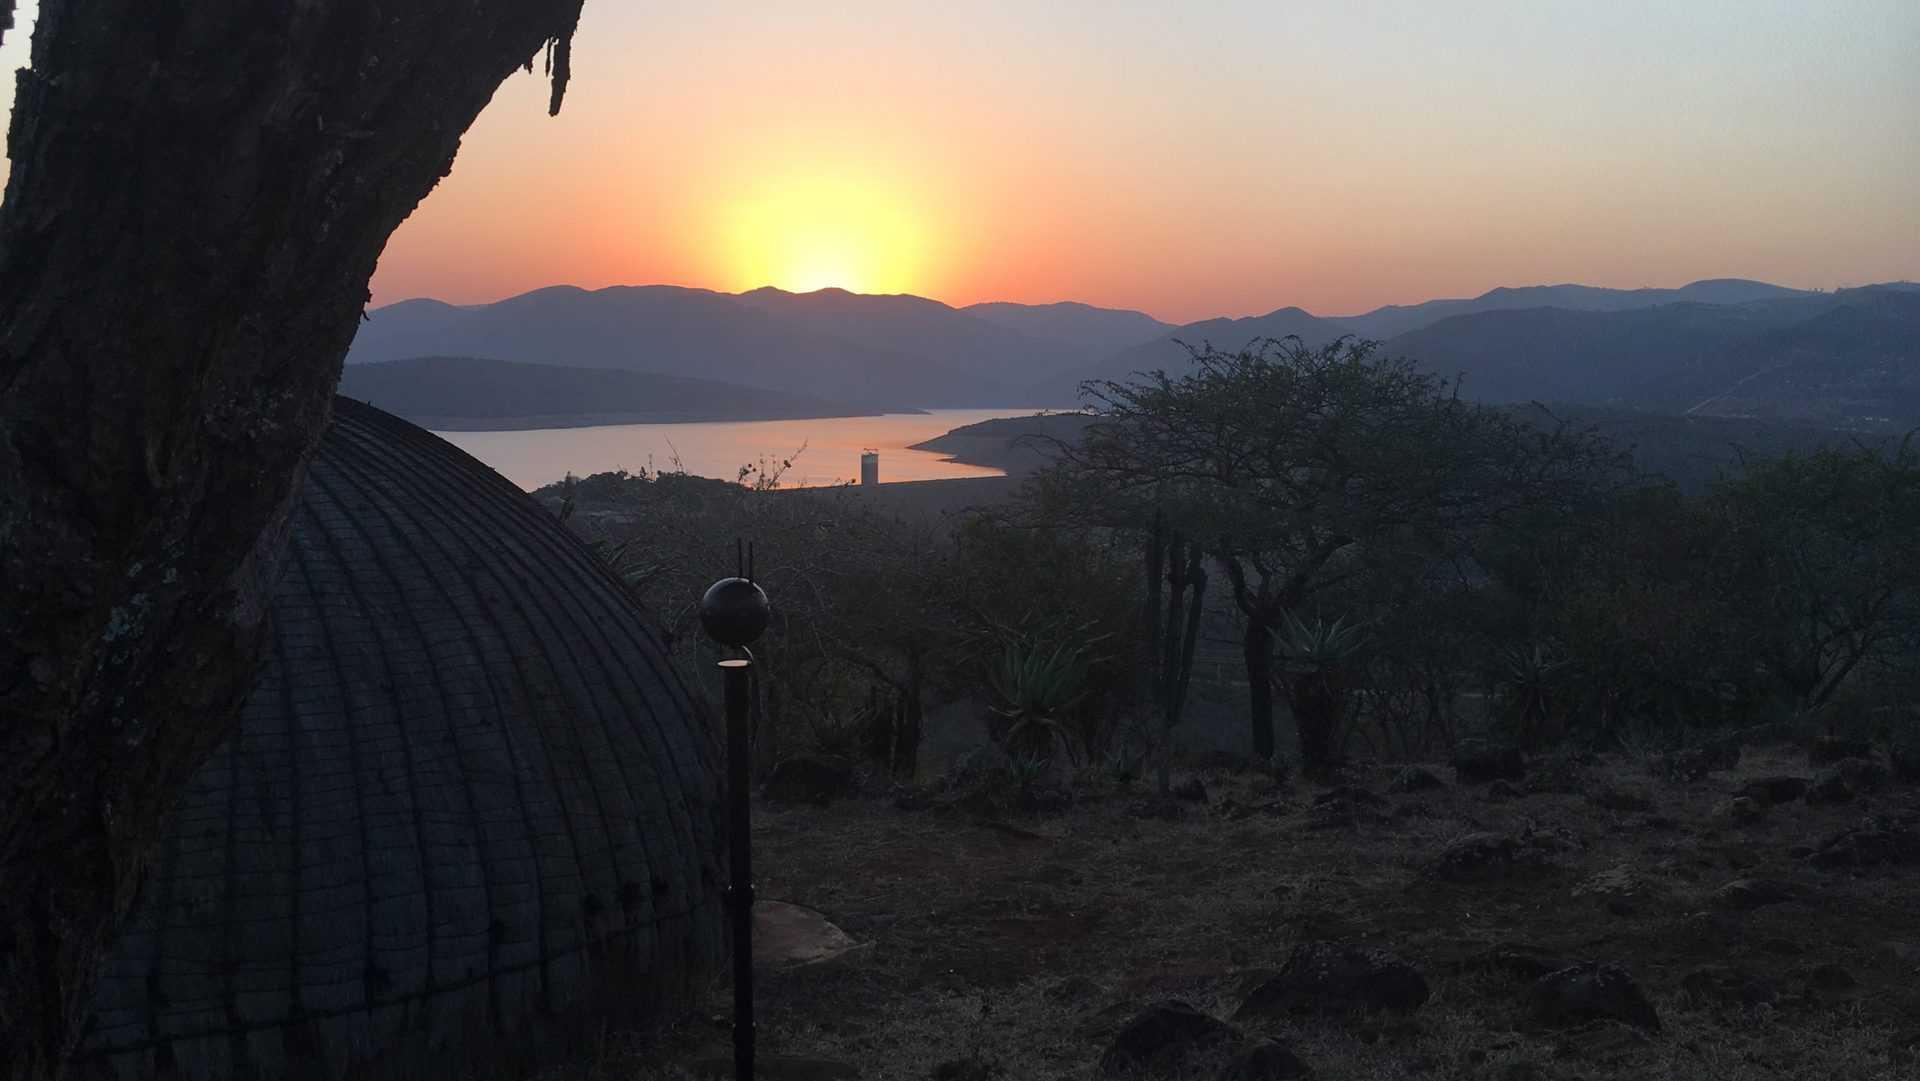 Shakaland Sunset